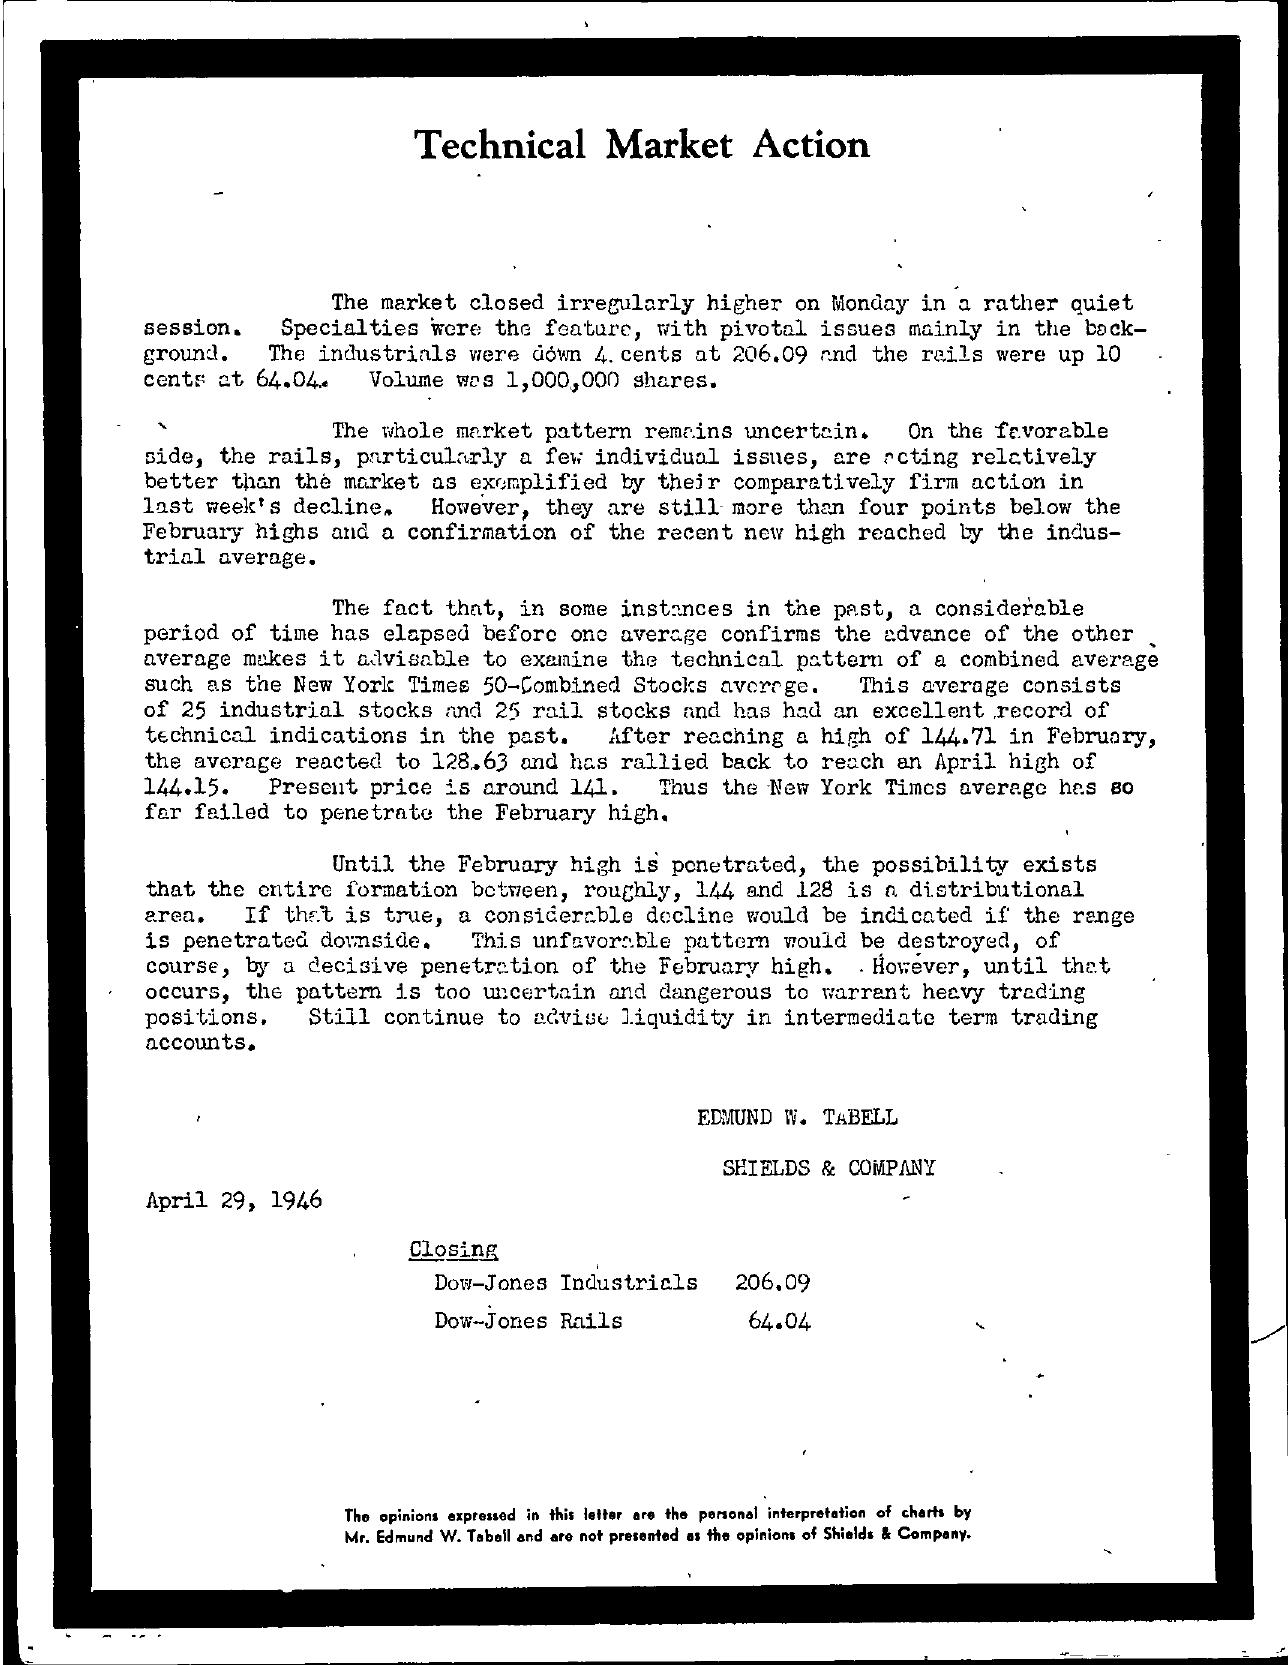 Tabell's Market Letter - April 29, 1946